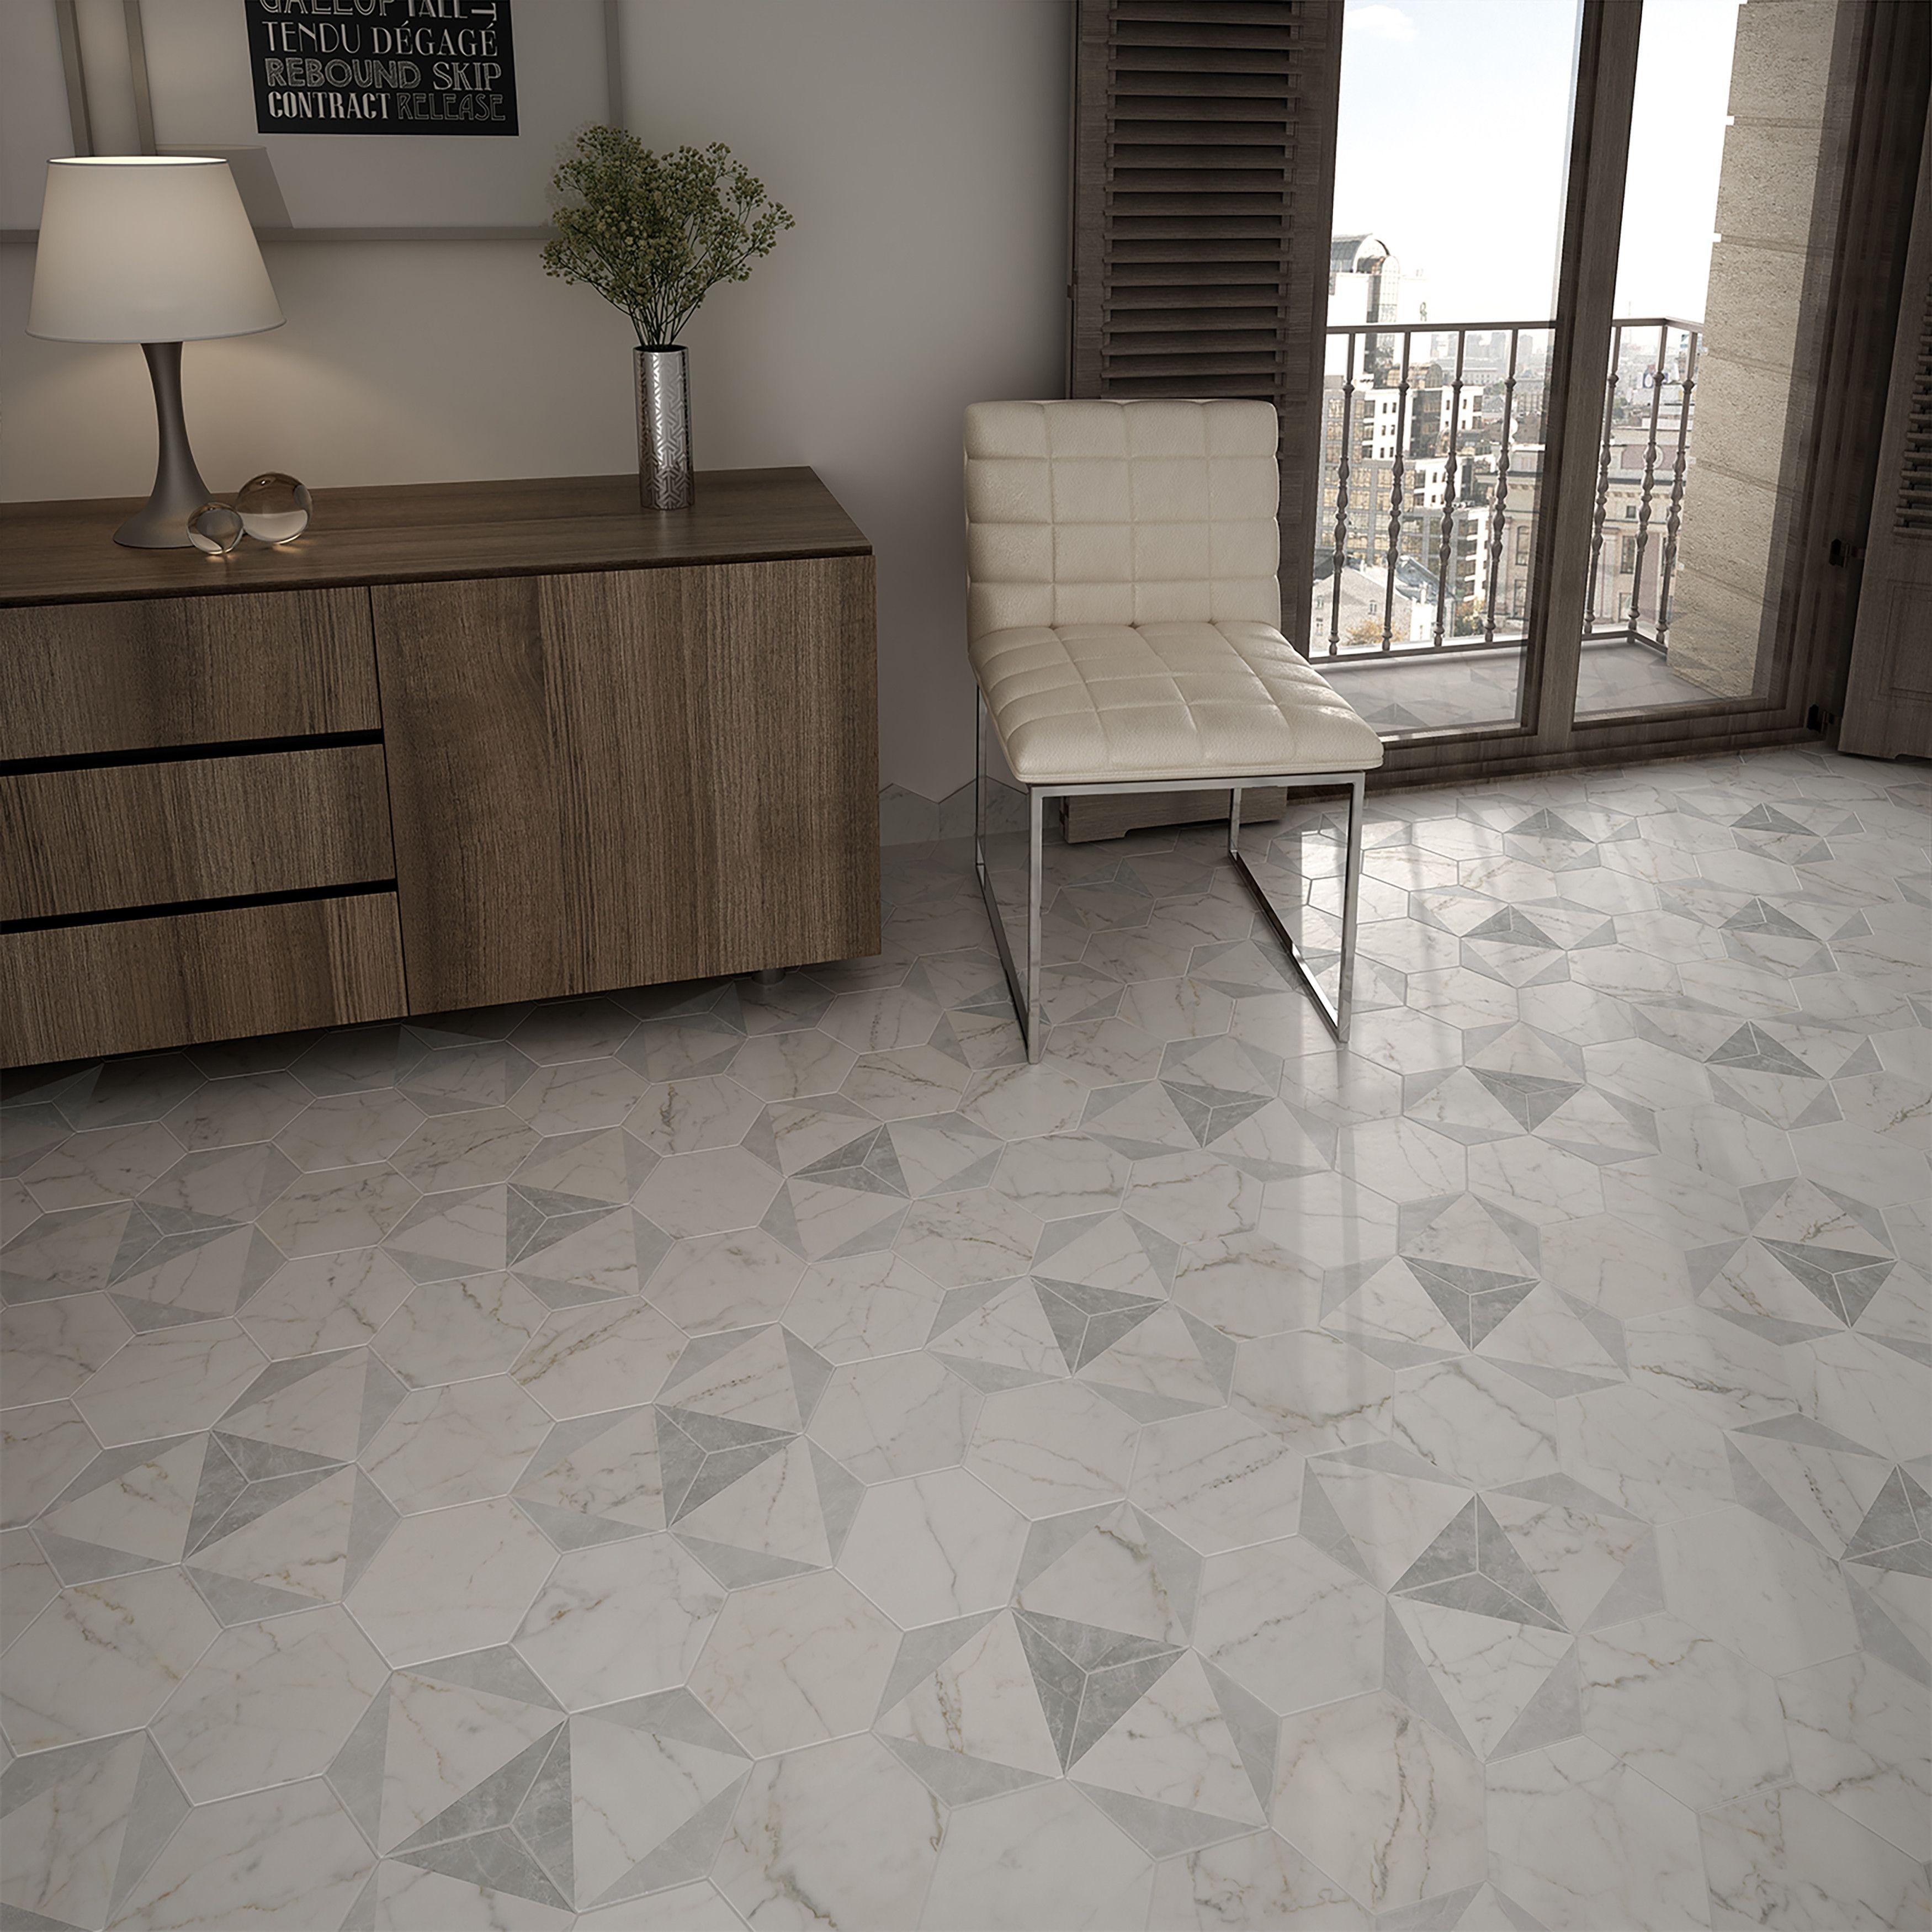 Karra 7 X 8 Porcelain Stone Look Wall And Floor Tile Flooring Wall Tiles Carrara